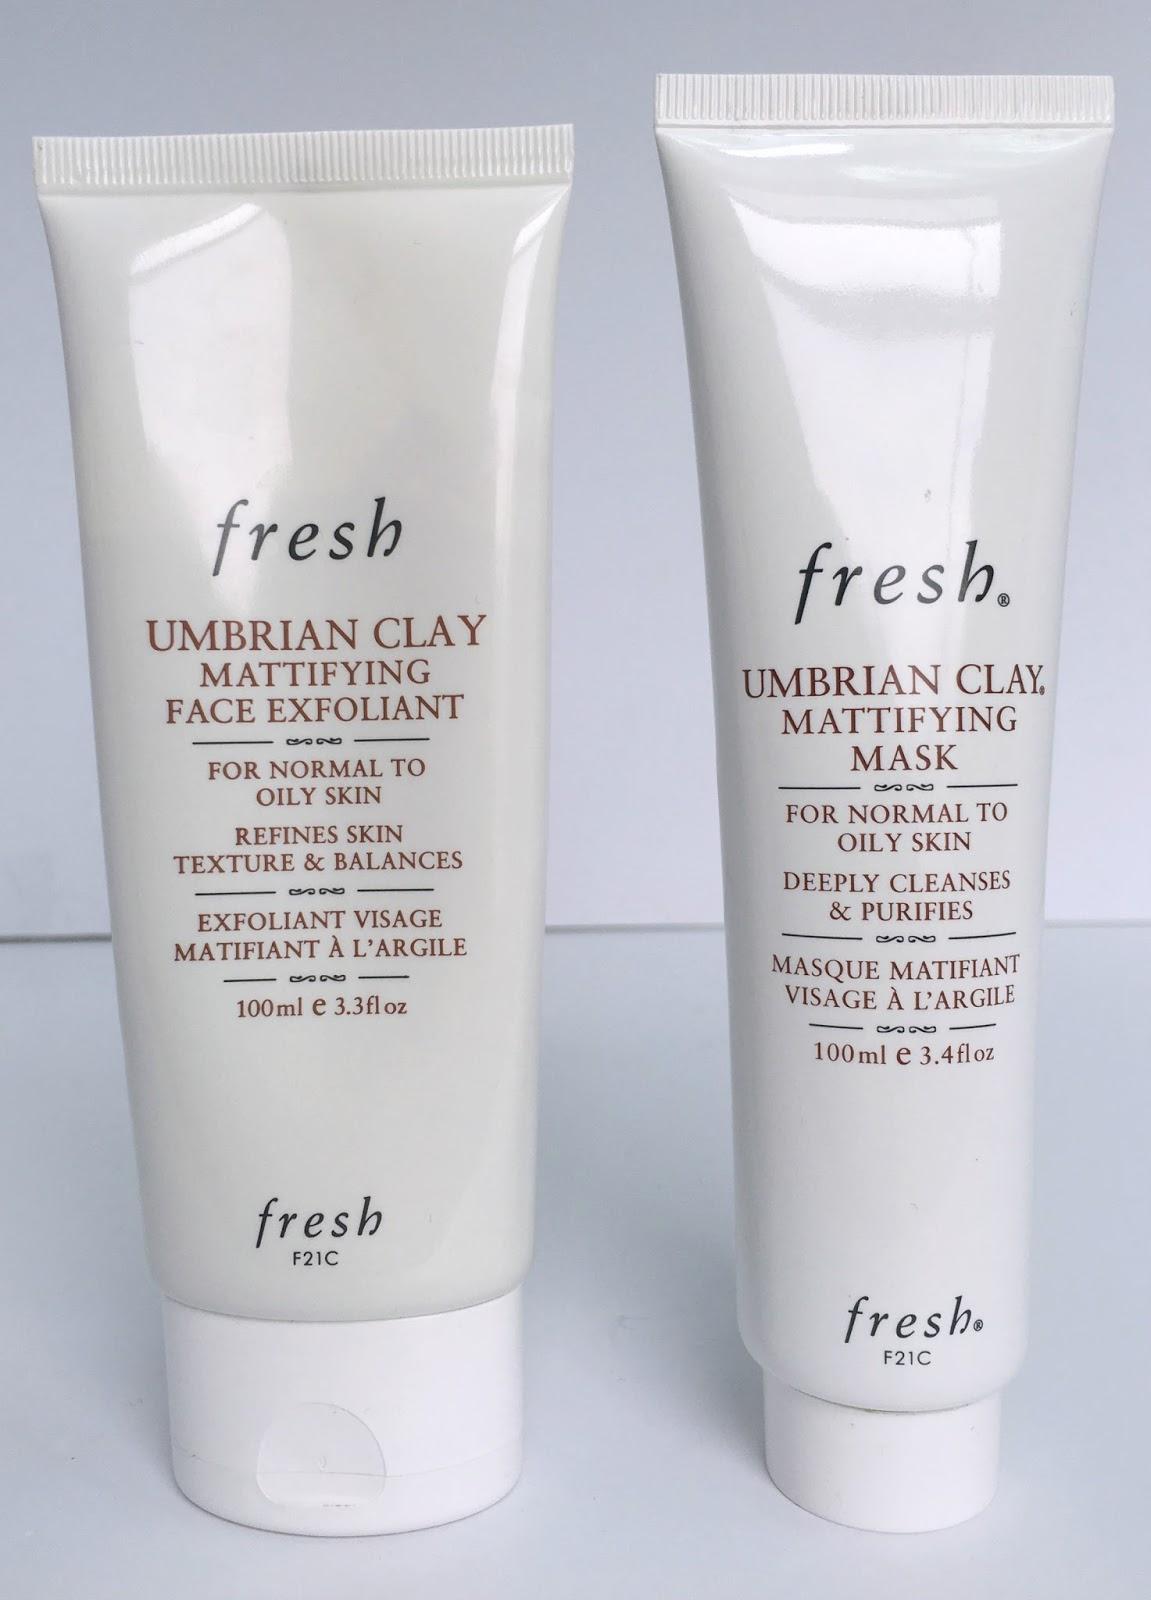 Fresh Umbrian Clay